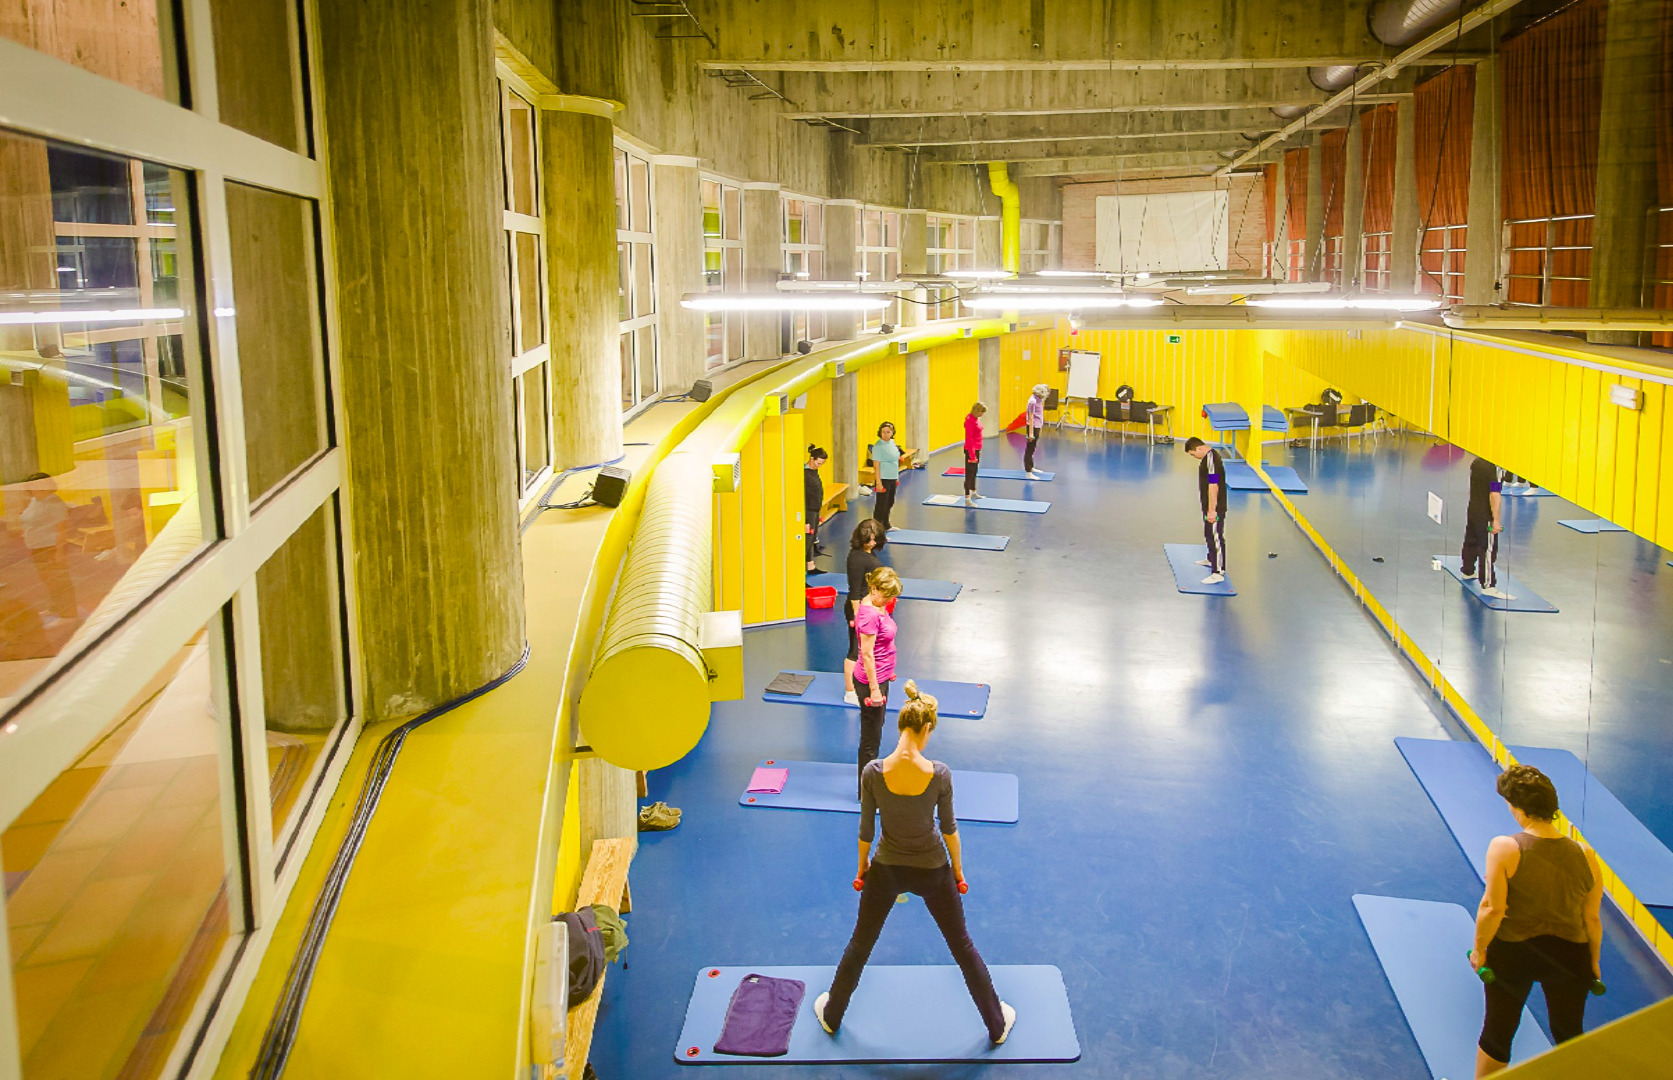 Oferta gimnasio centro deportivo m86 madrid gymforless for Gimnasio piscina madrid